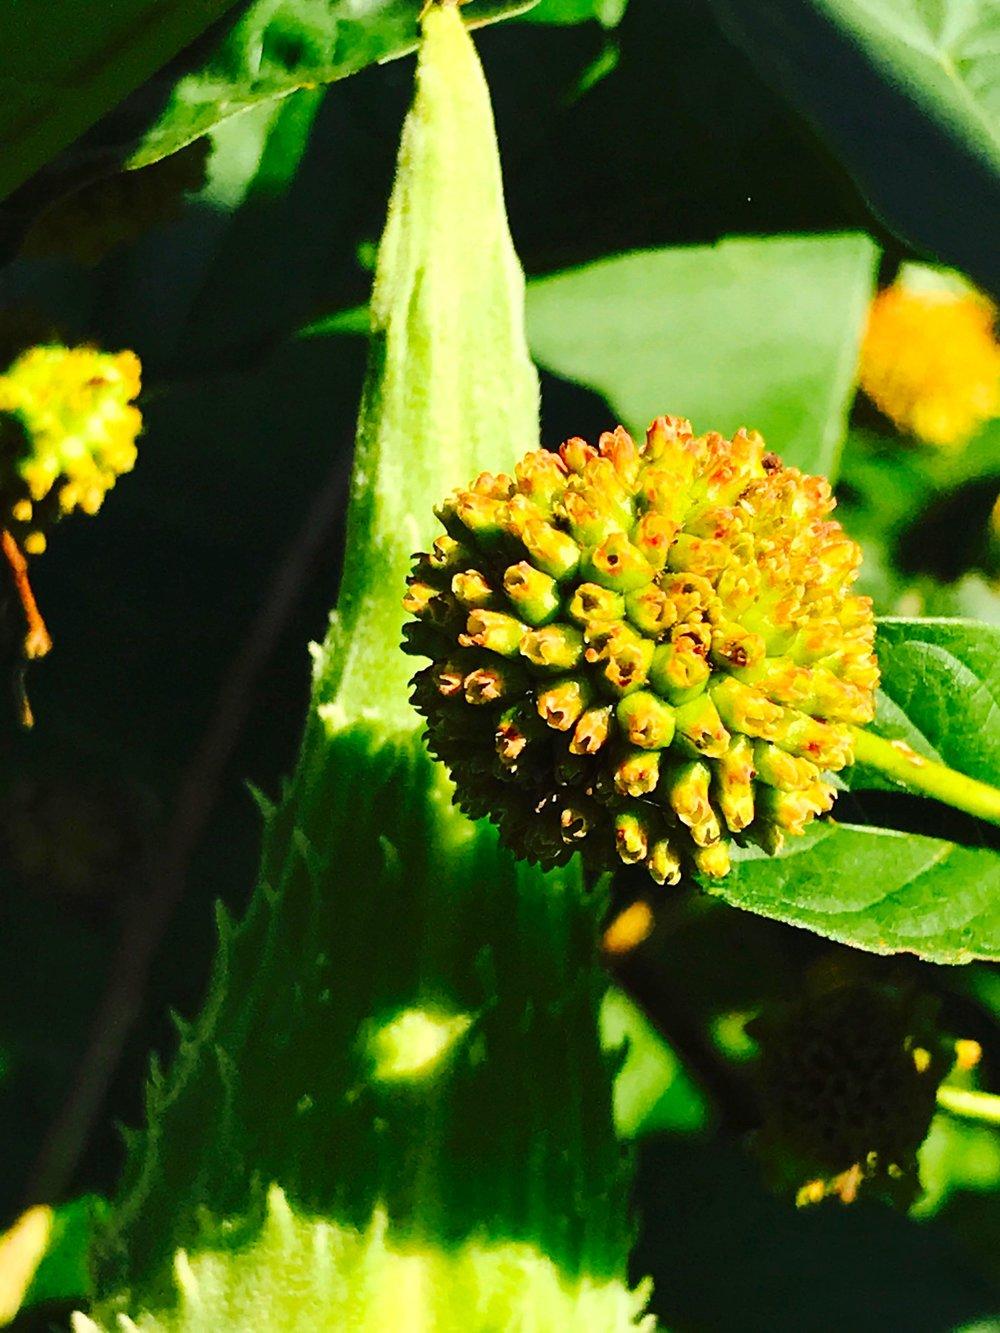 Buttonbush and Milkweed Pod